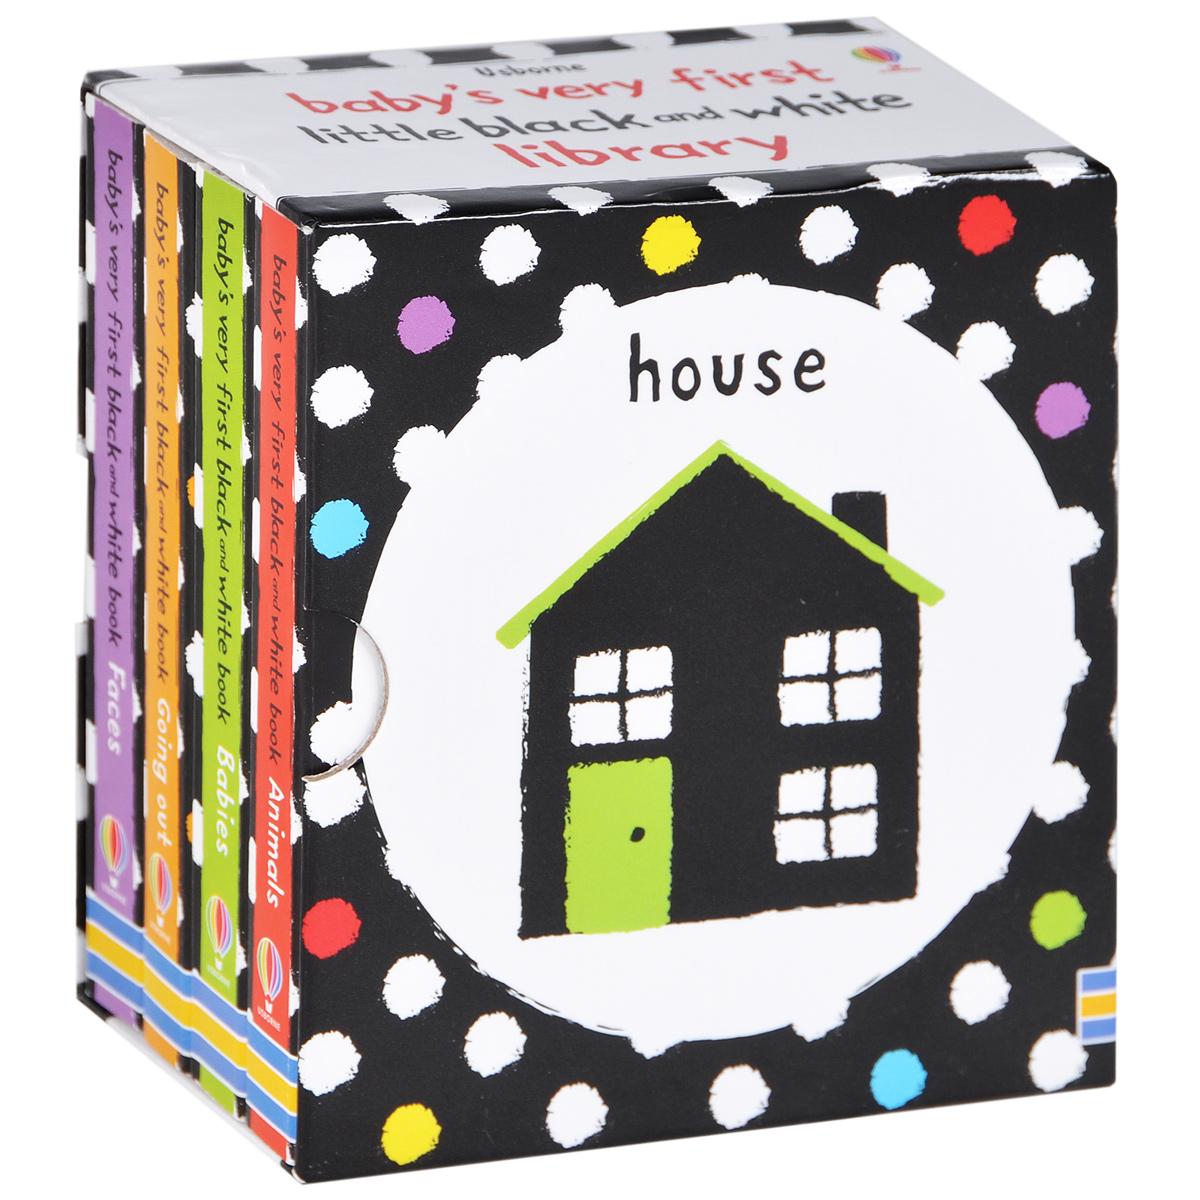 Baby's Very First Black & White Little Library (комплект из 4 миниатюрных изданий) holbein colour library